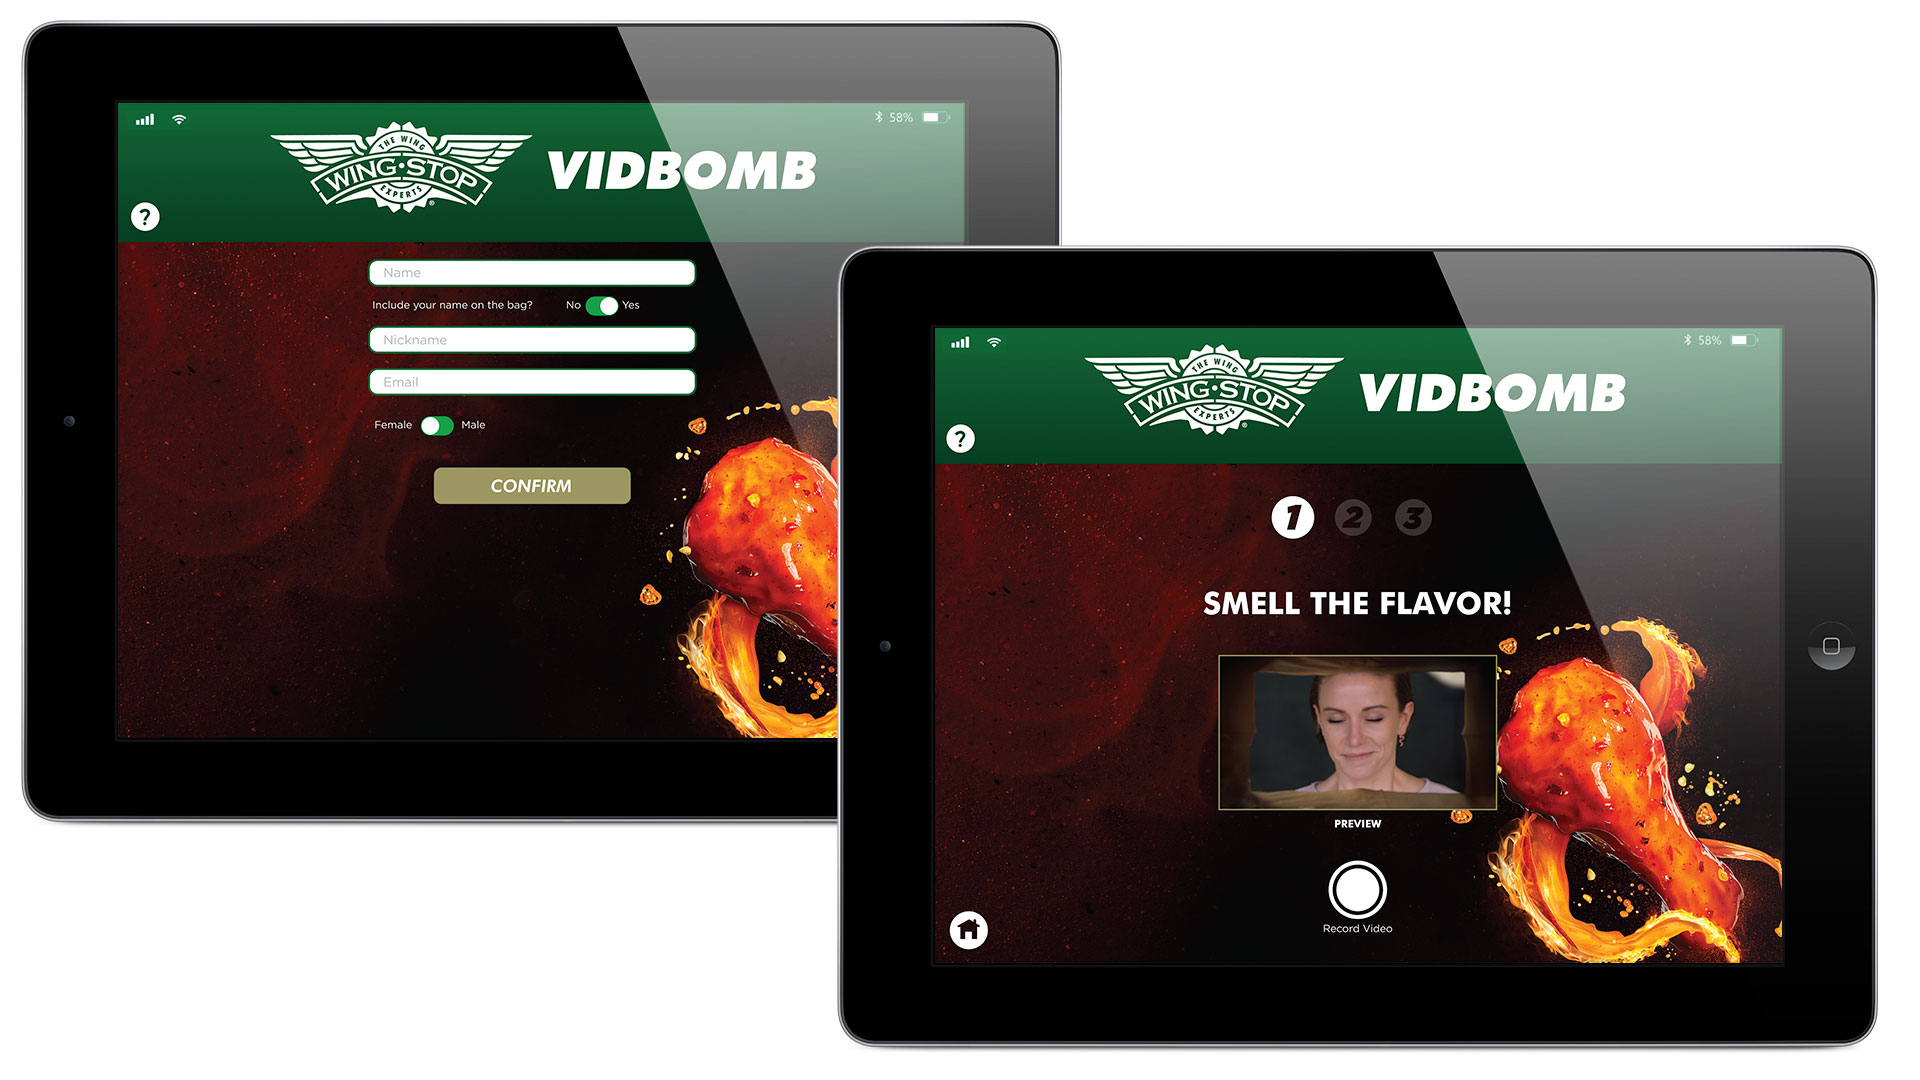 vidbomb app